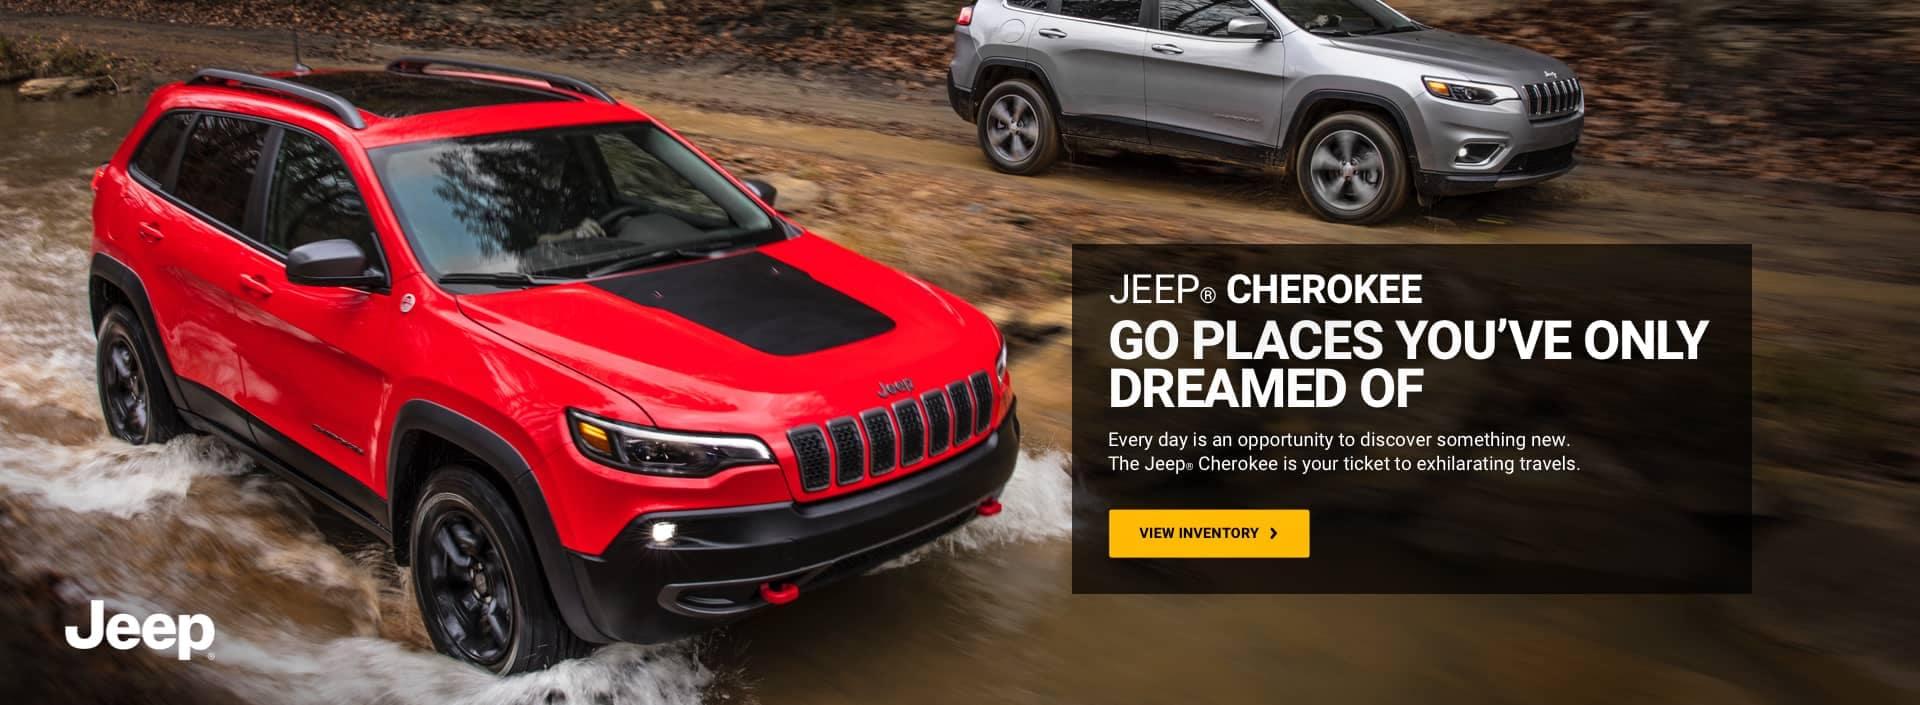 Jeep Cherokee banner